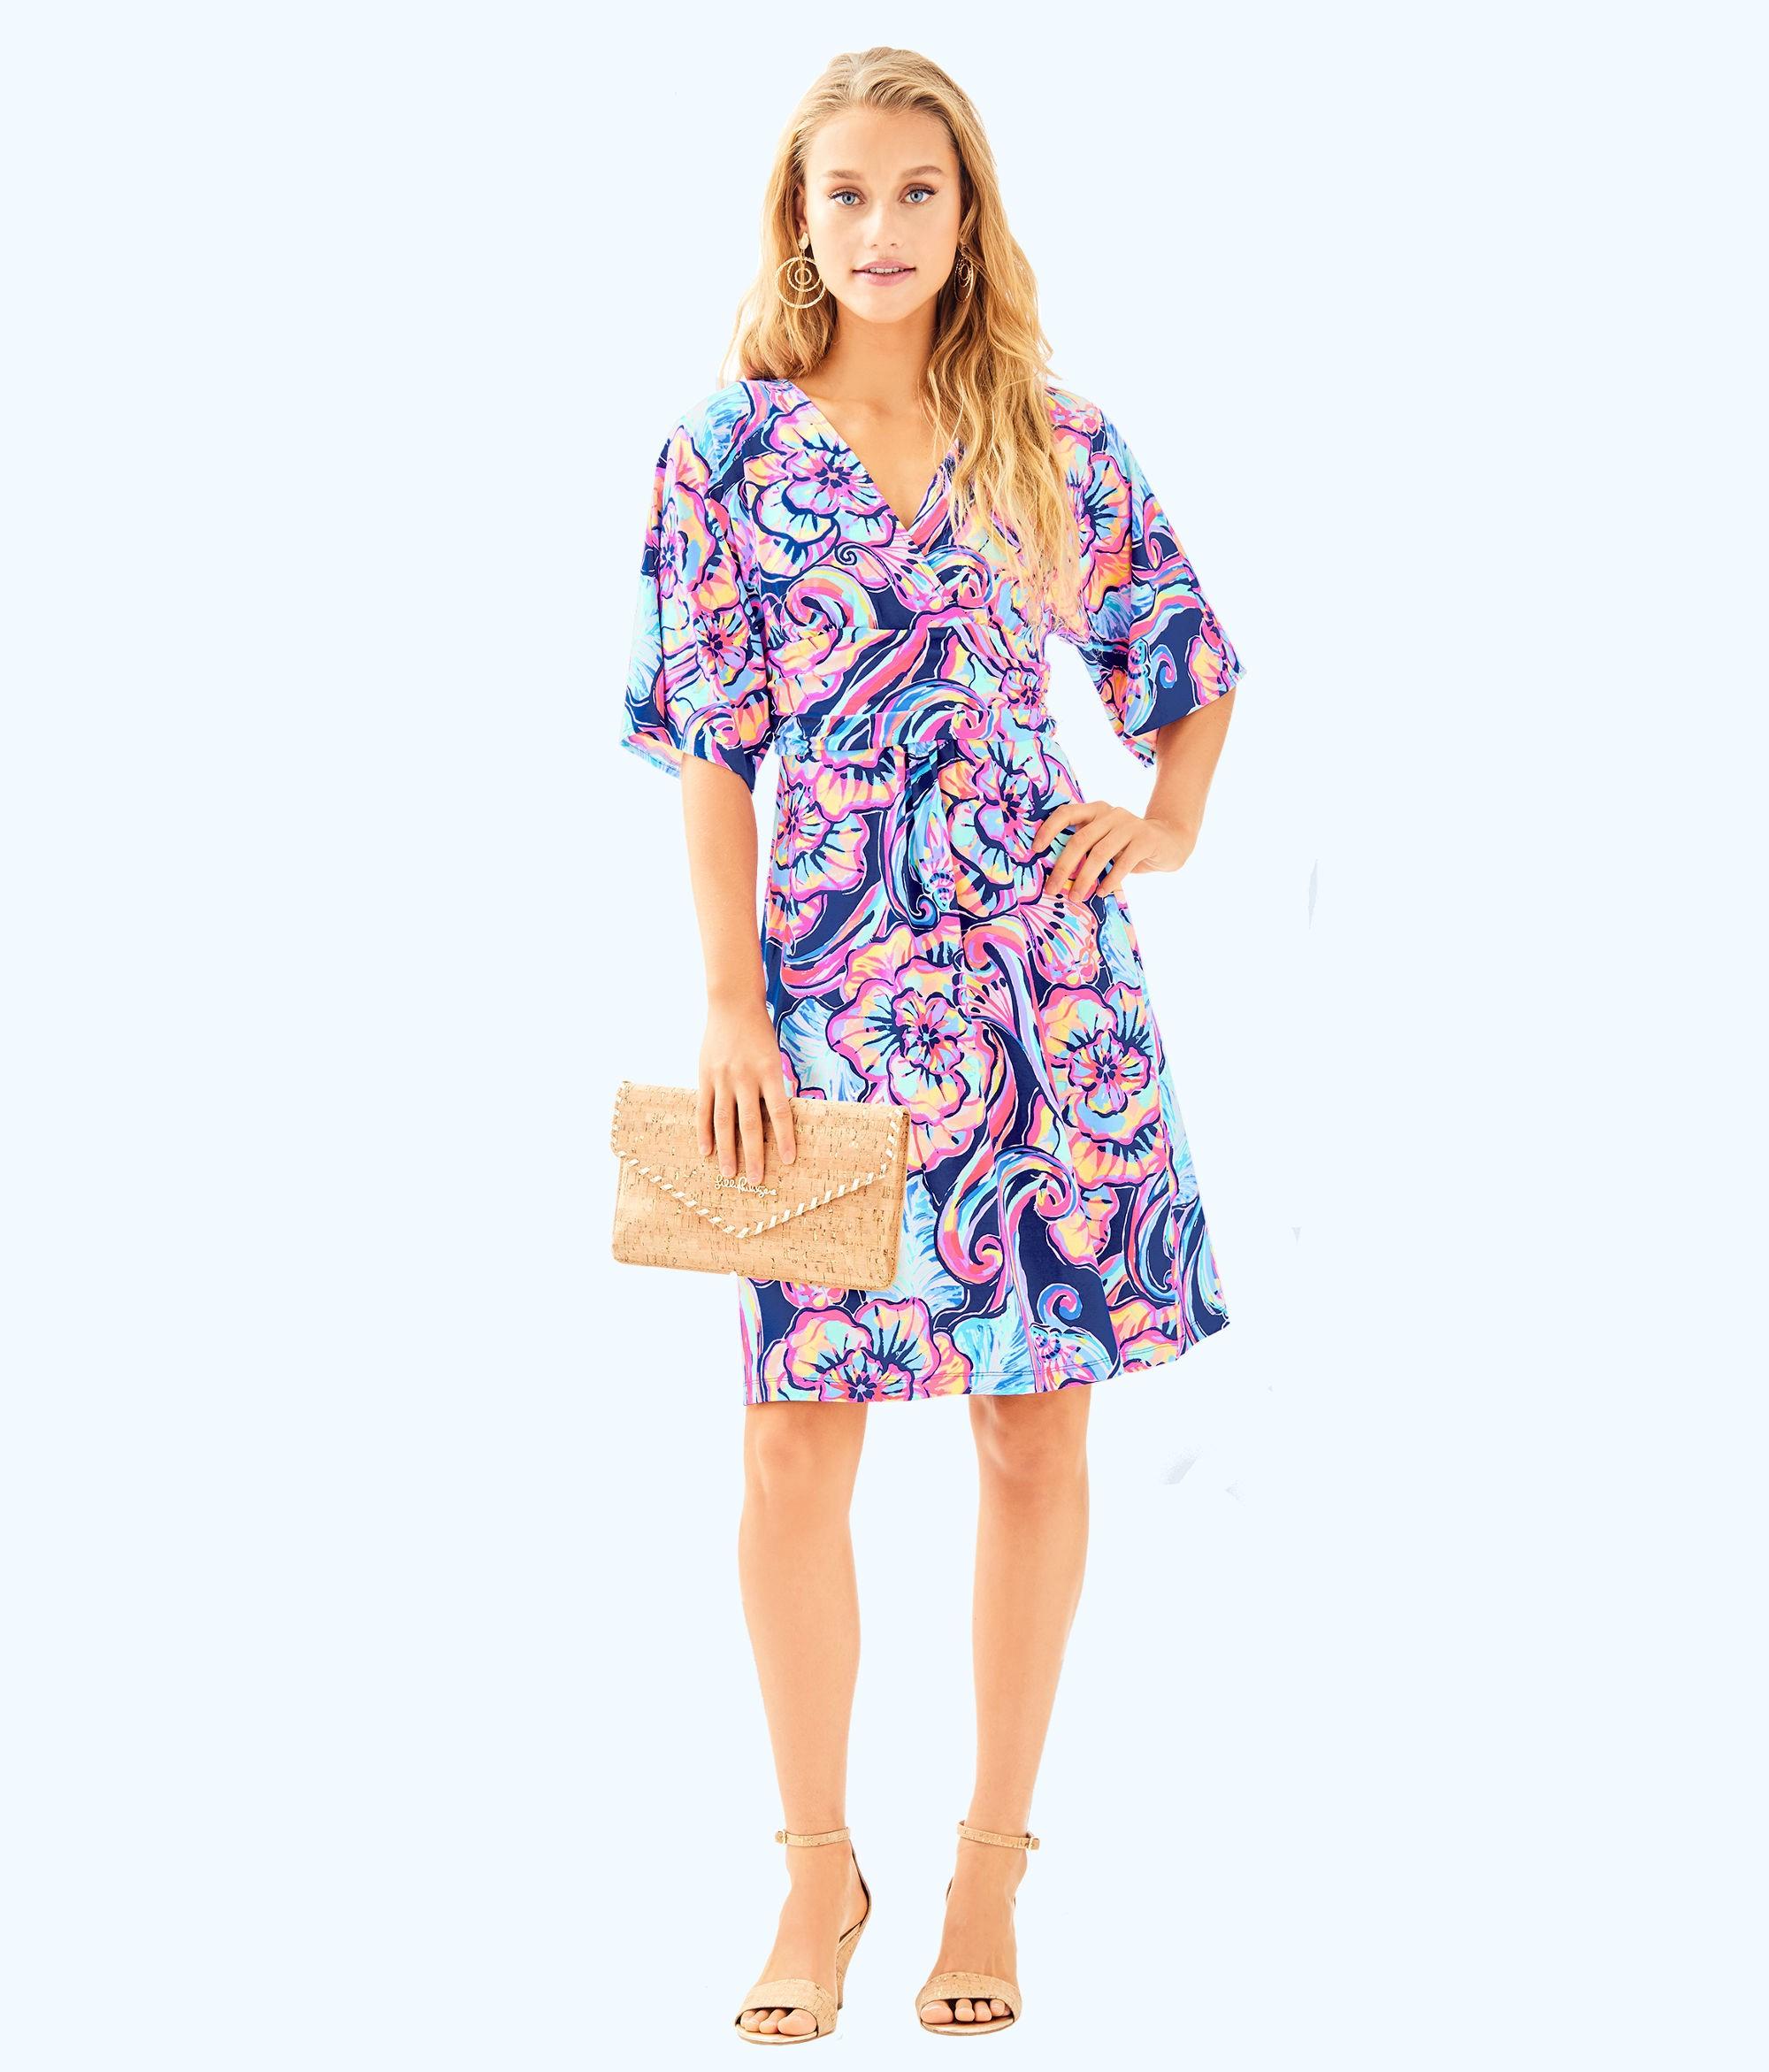 38dfe5472146f Lilly Pulitzer Parigi Dress - XXS